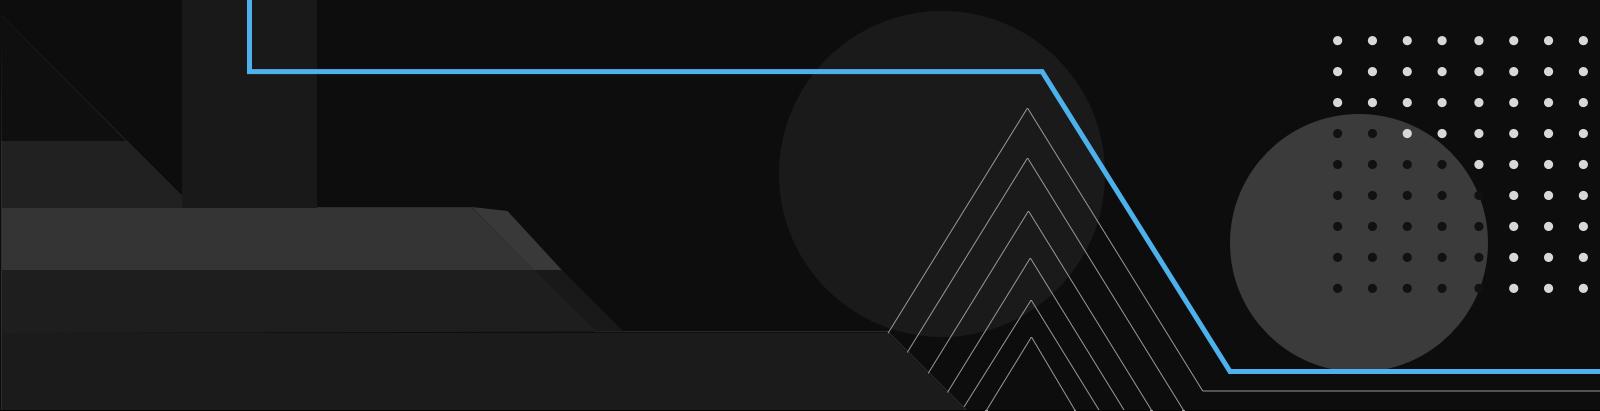 Chrome New Updates